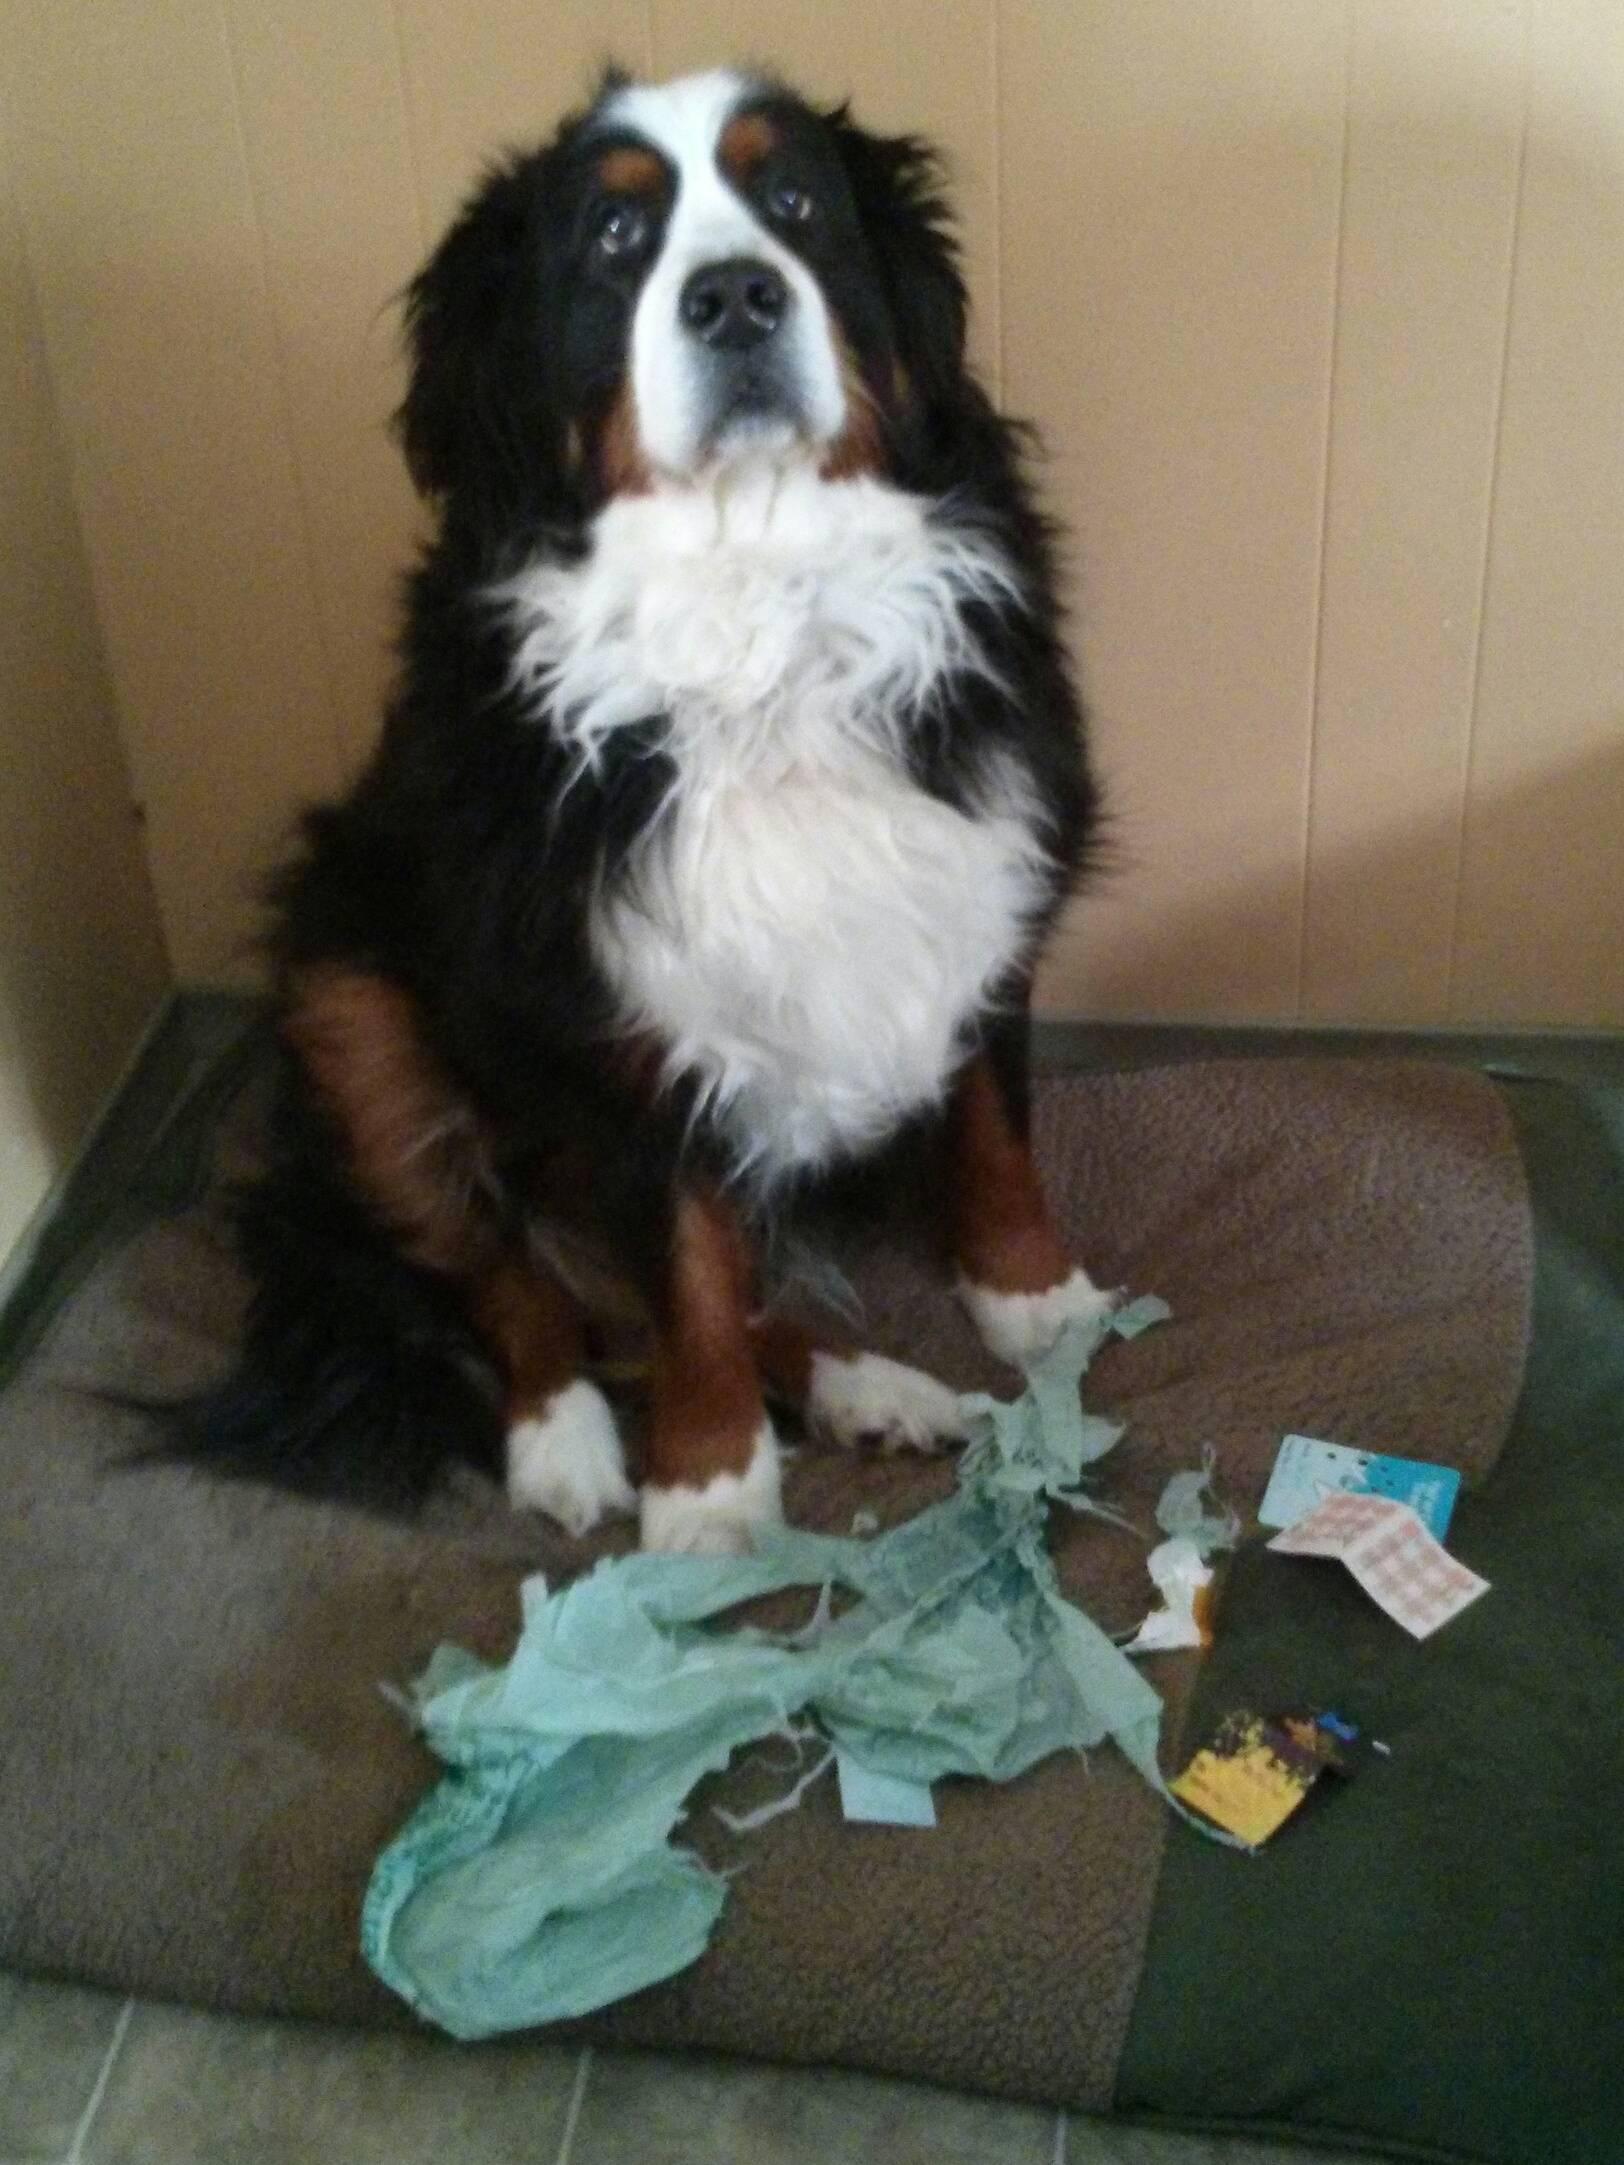 skyldig_hund (9)